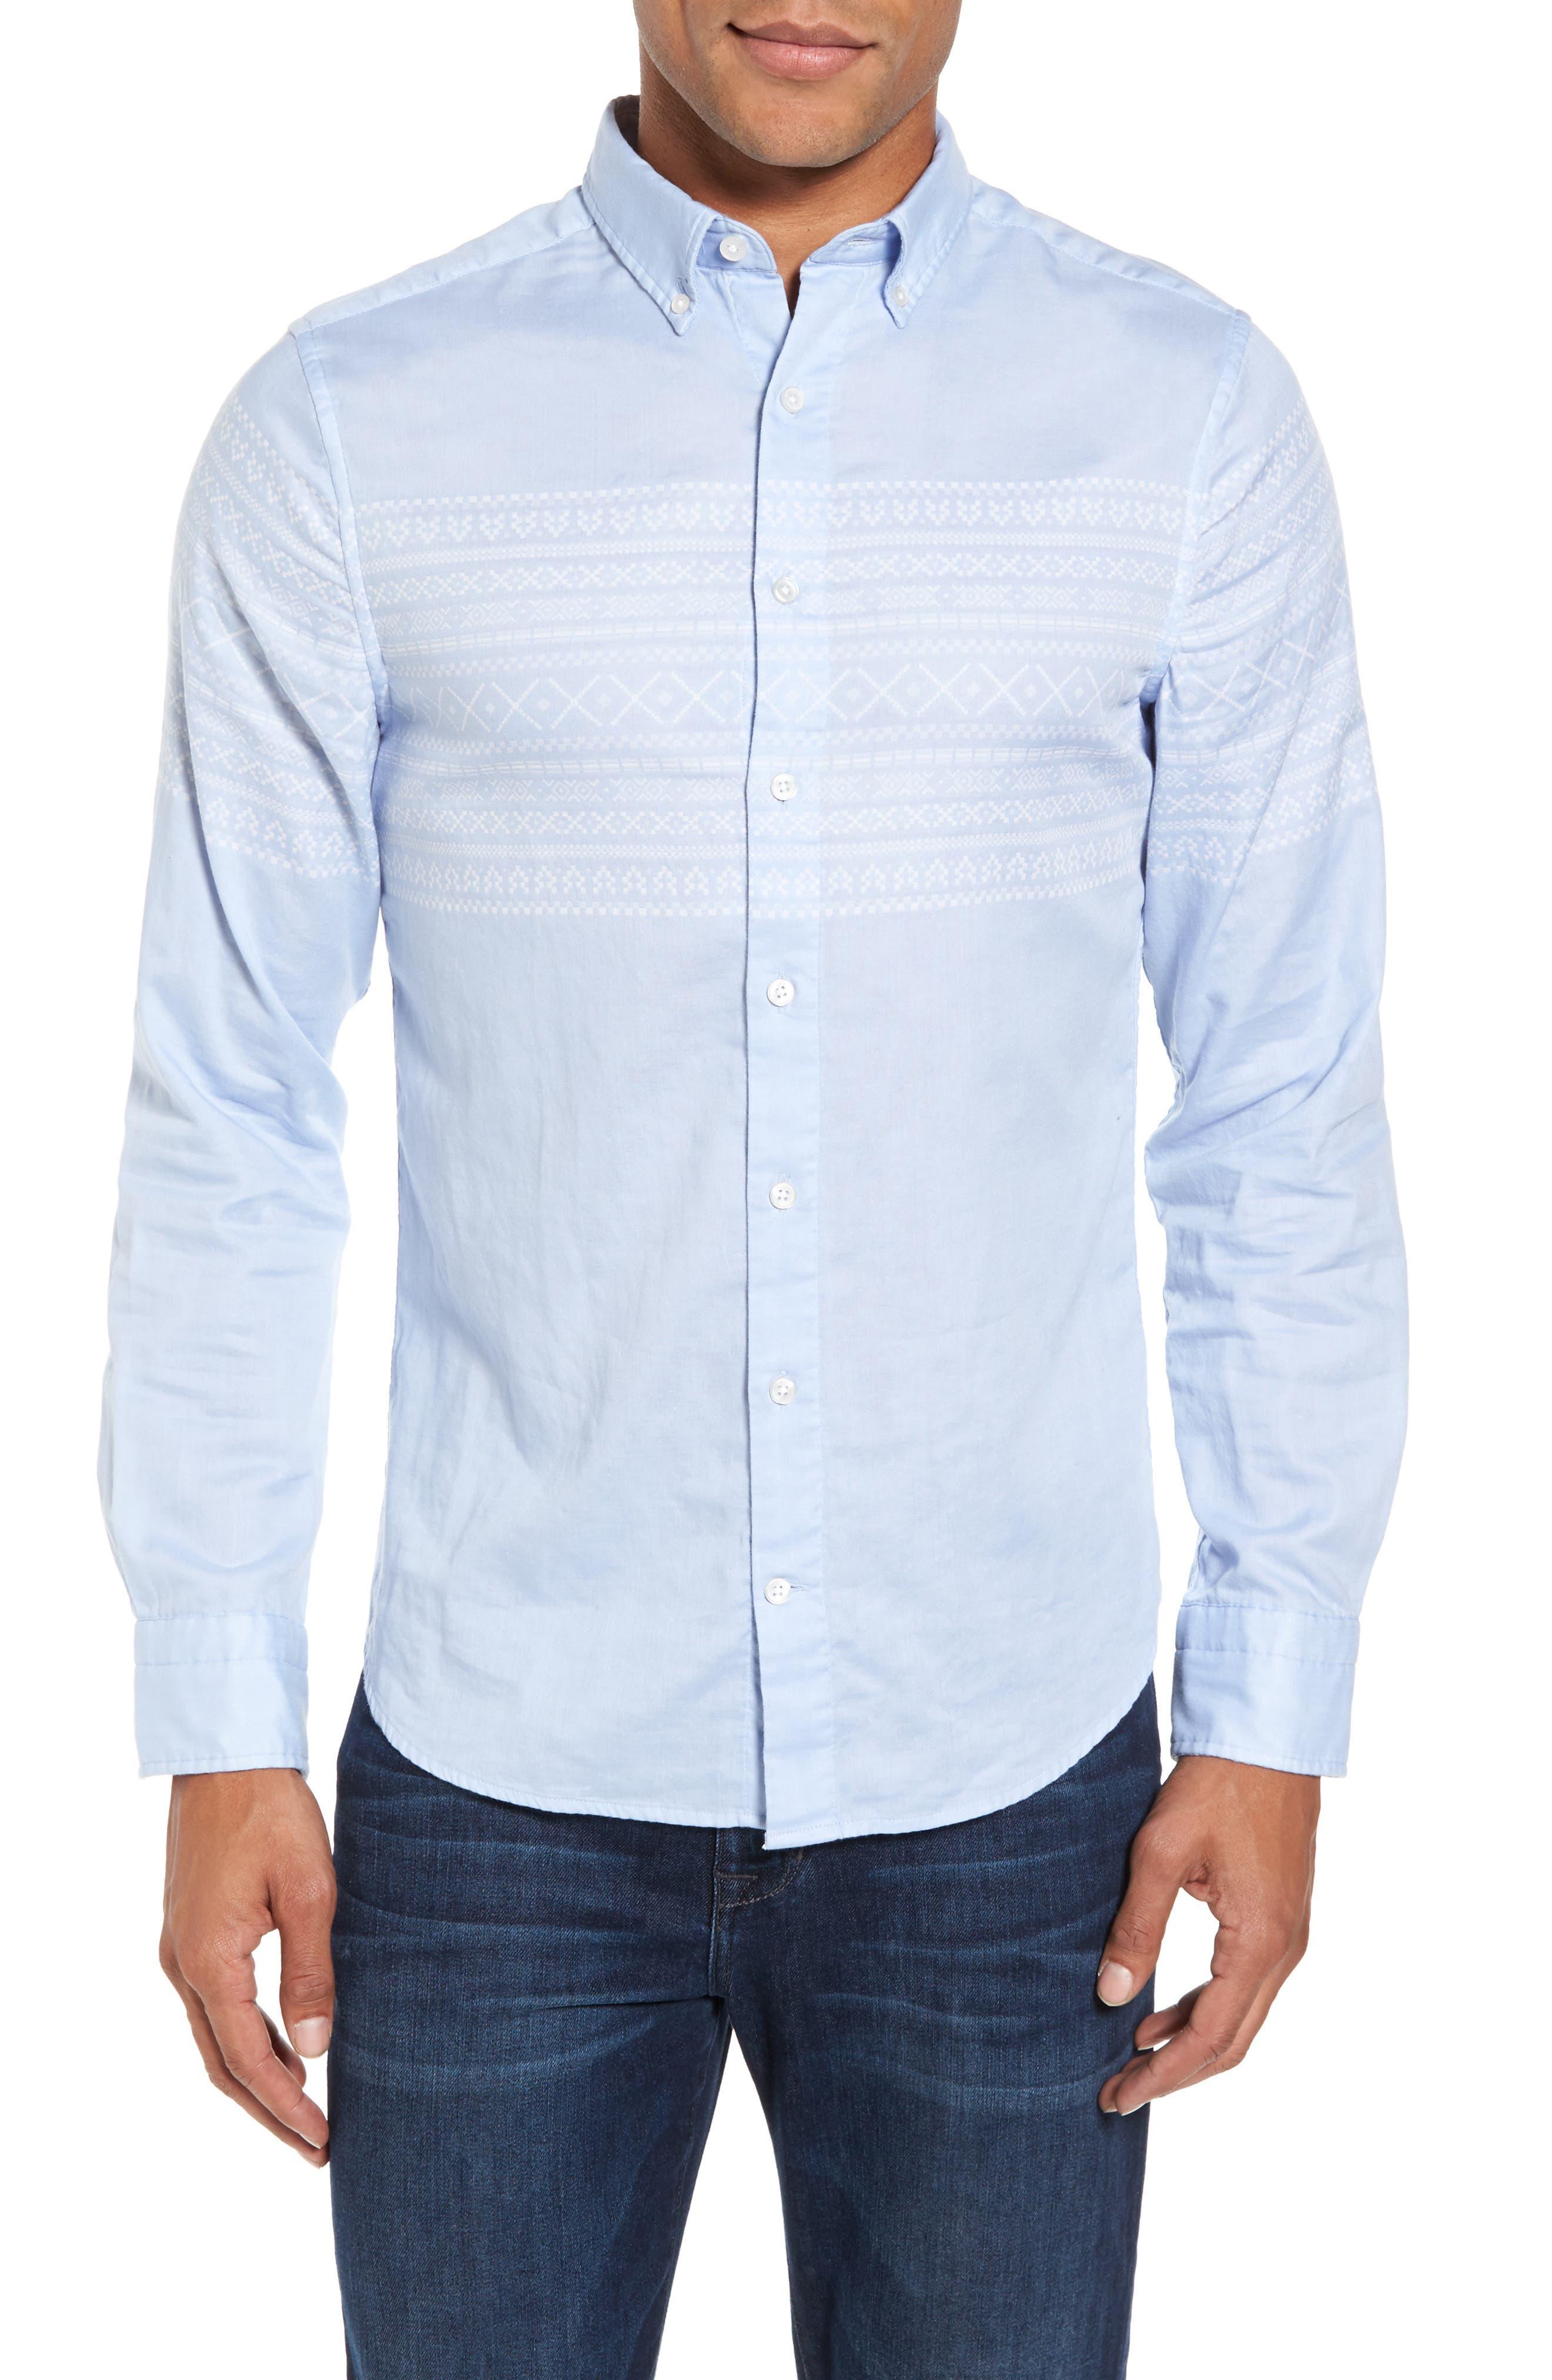 02 Extra Slim Fit Fair Isle Print Sport Shirt,                         Main,                         color, 420